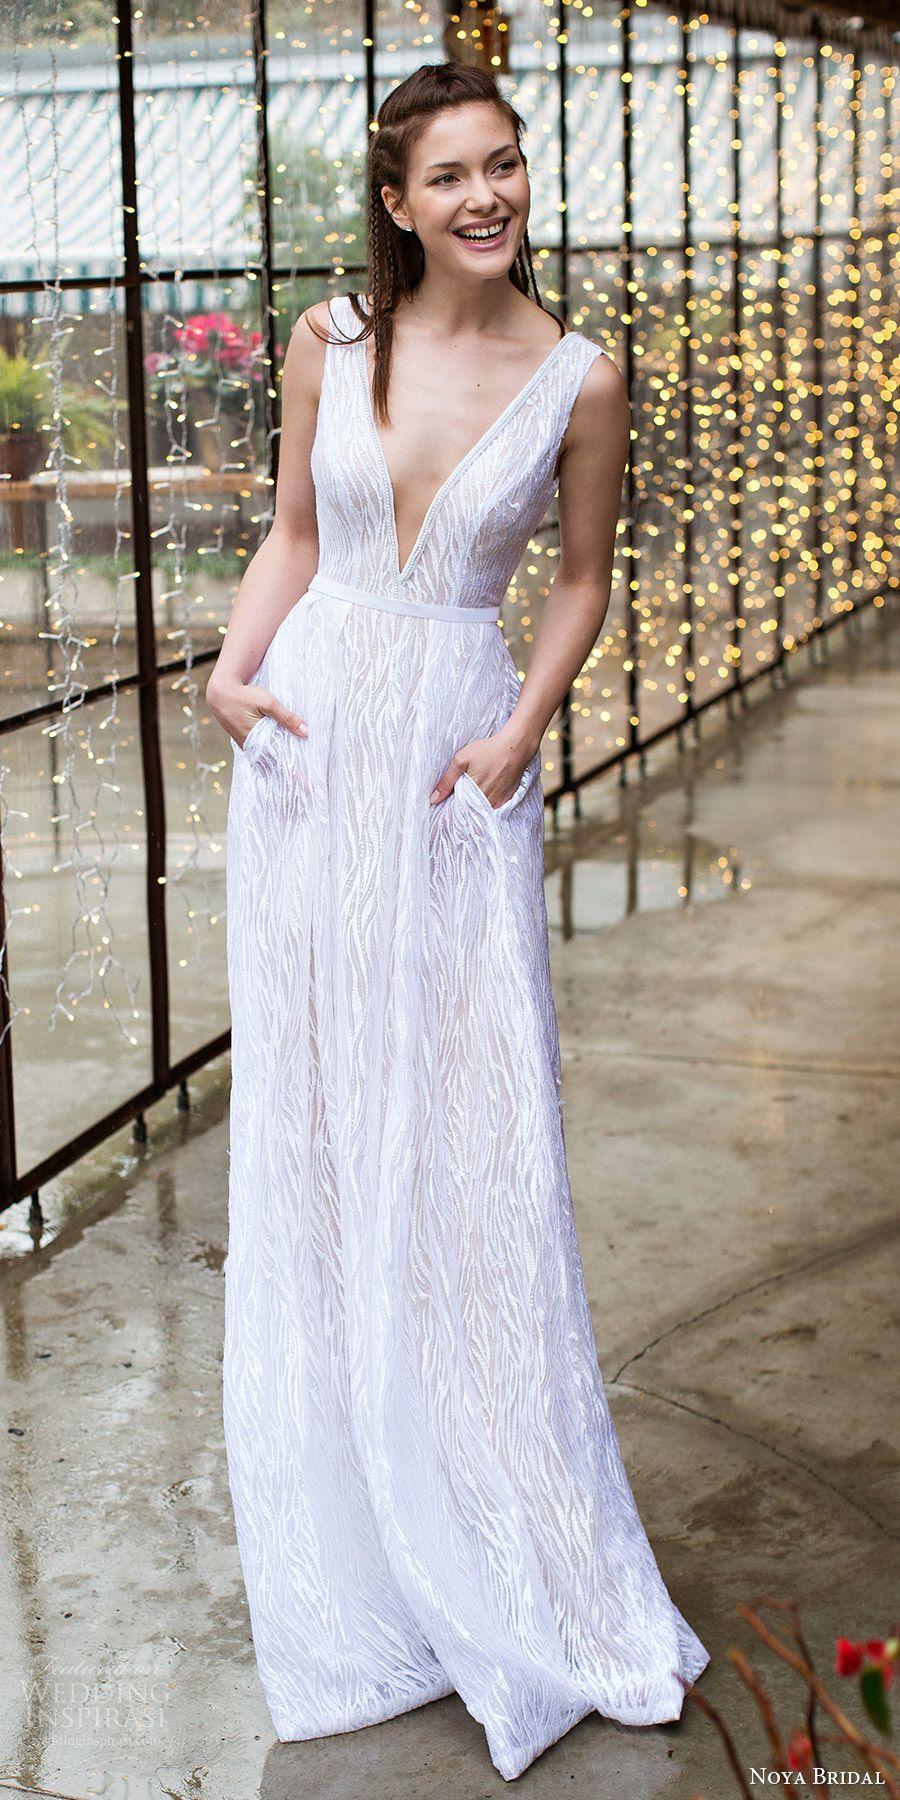 Lace dress zalora may 2019 Celi Hai Yen celihaiyen on Pinterest